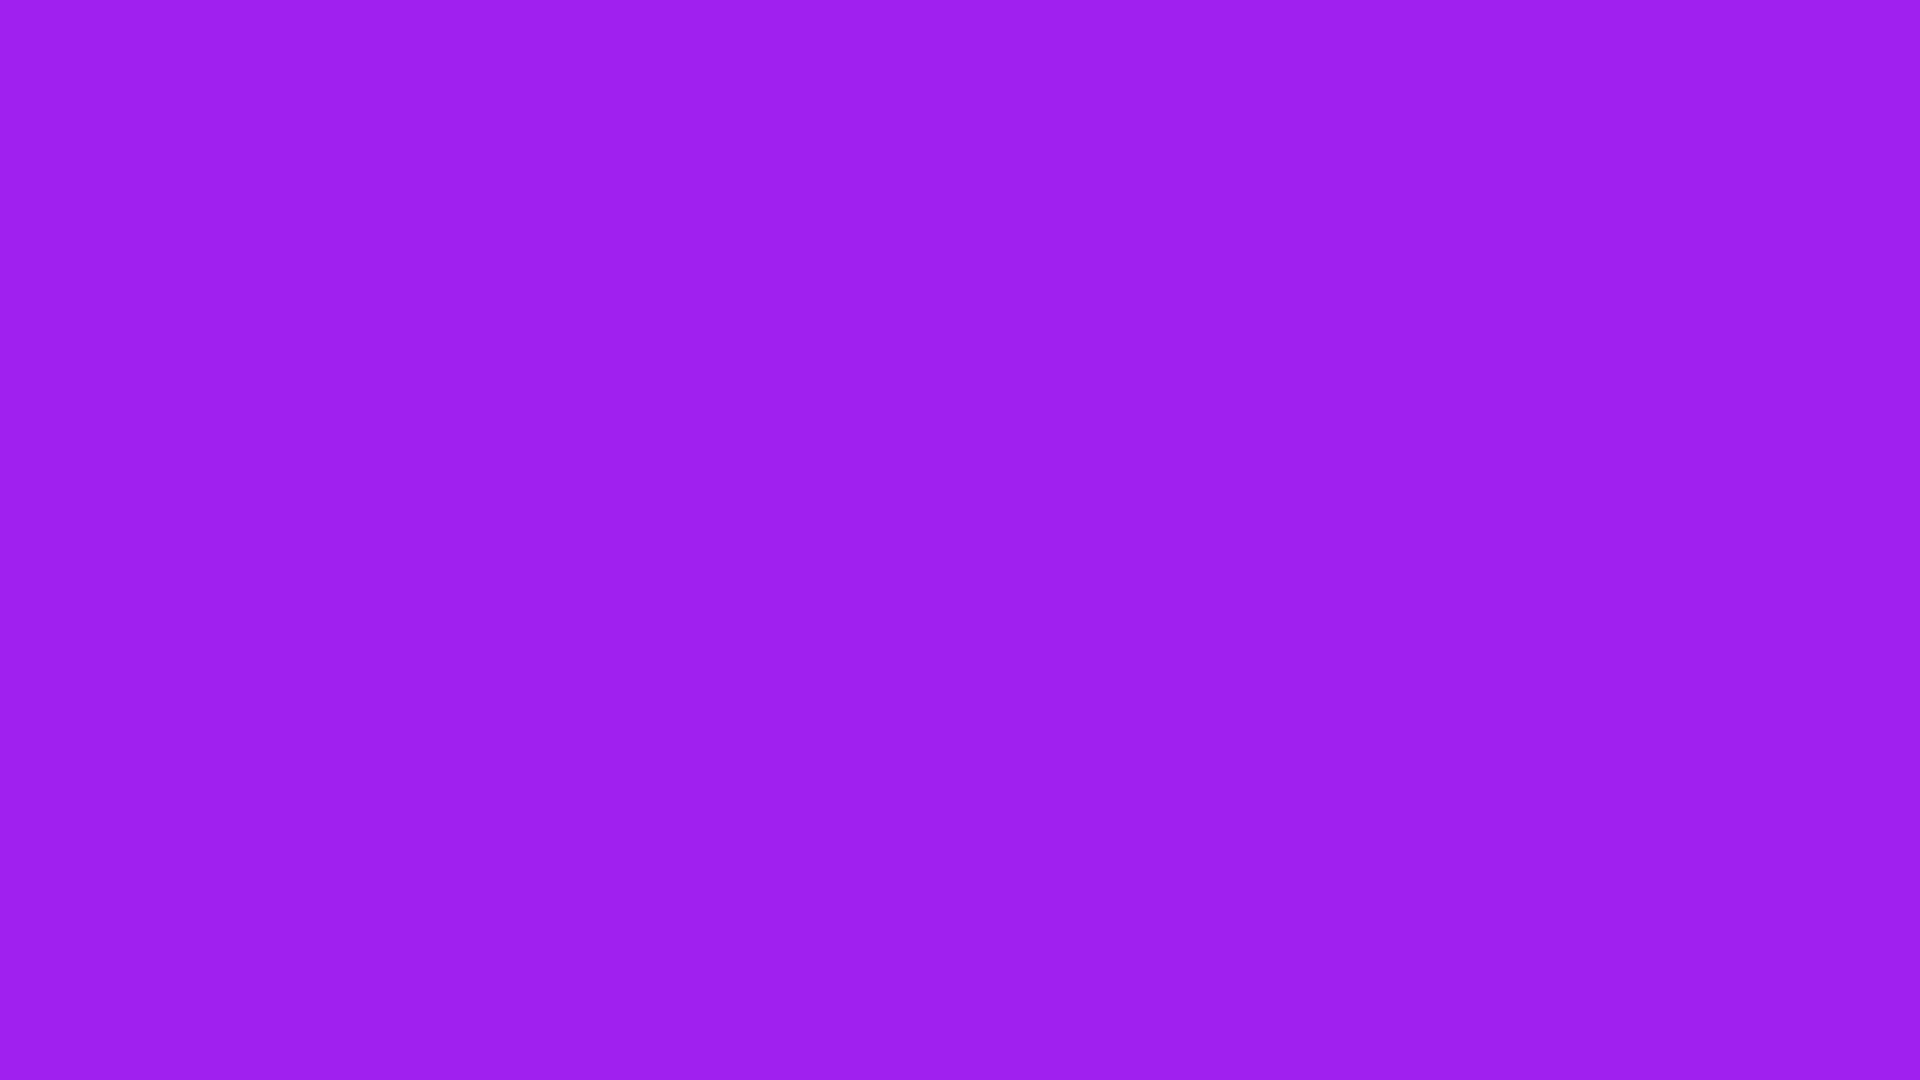 1920x1080 Purple X11 Gui Solid Color Background